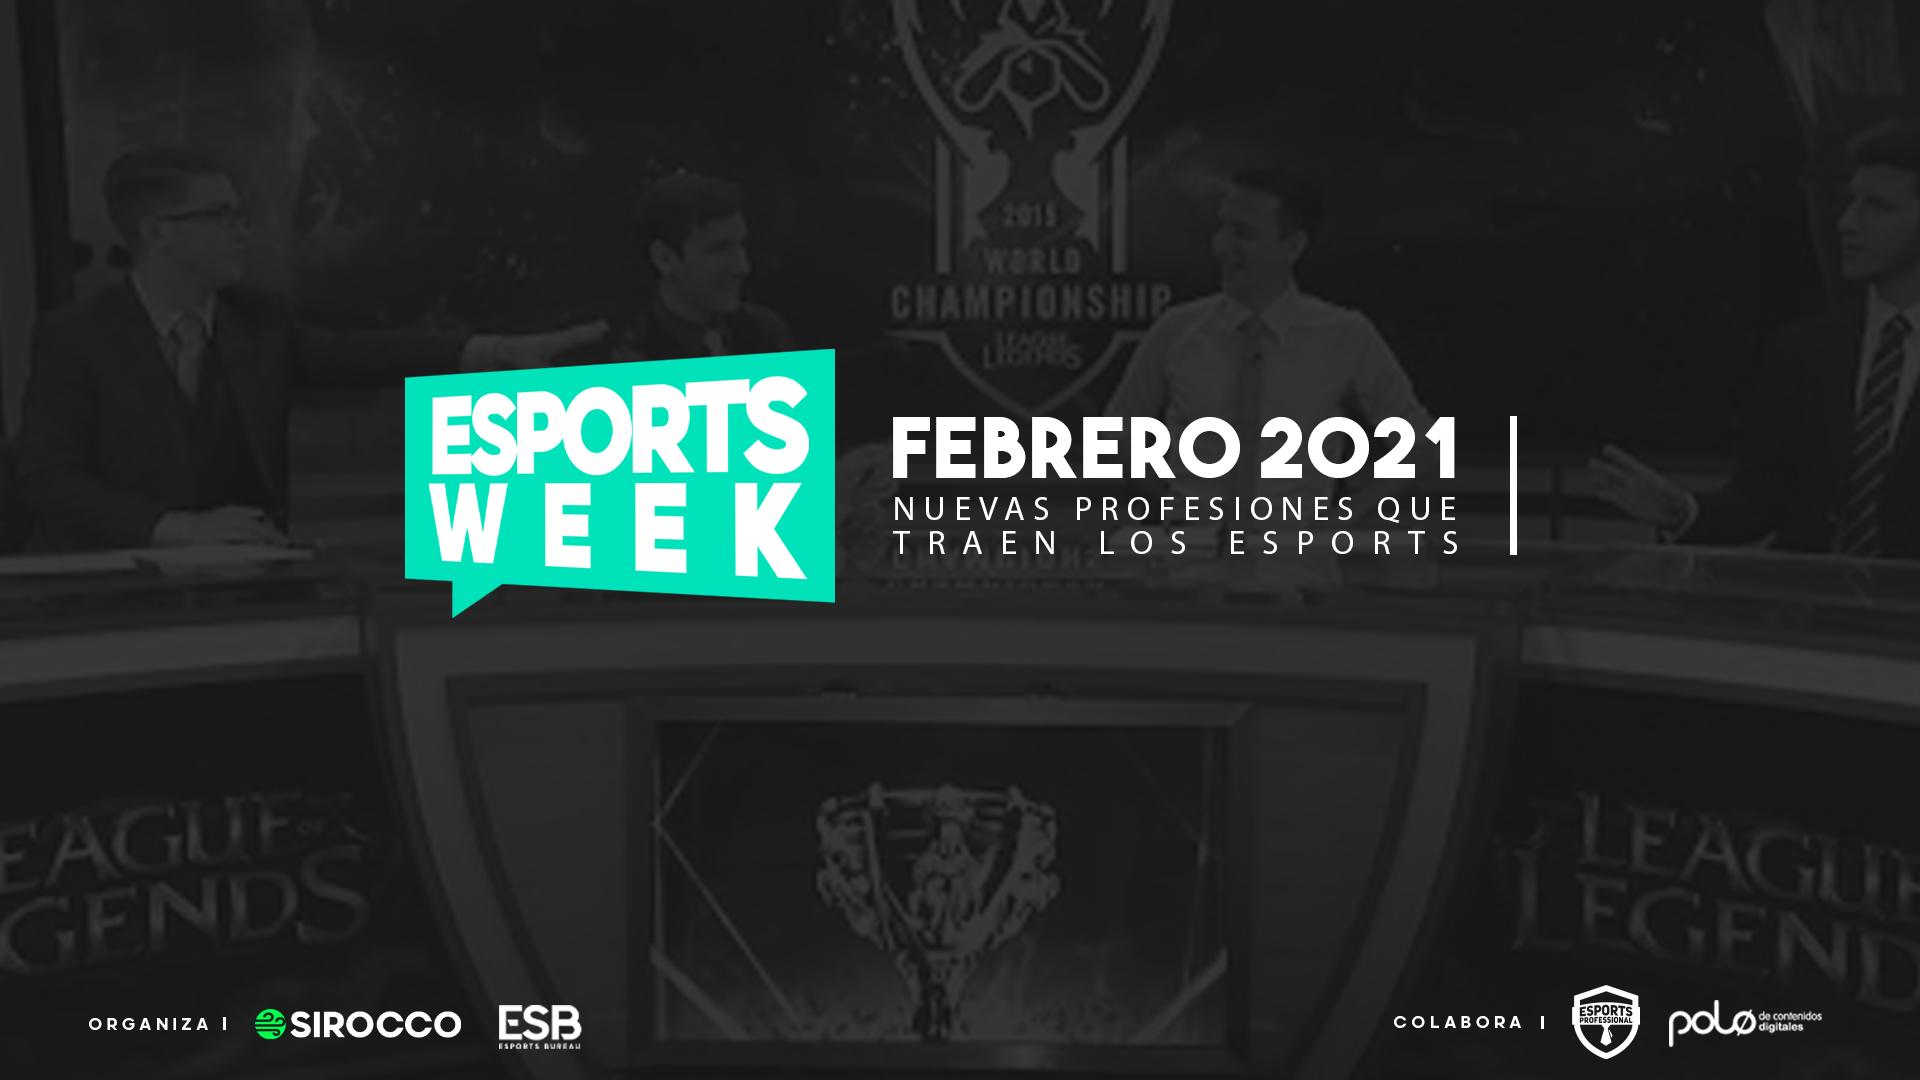 Esports Week Profesiones Epsorts